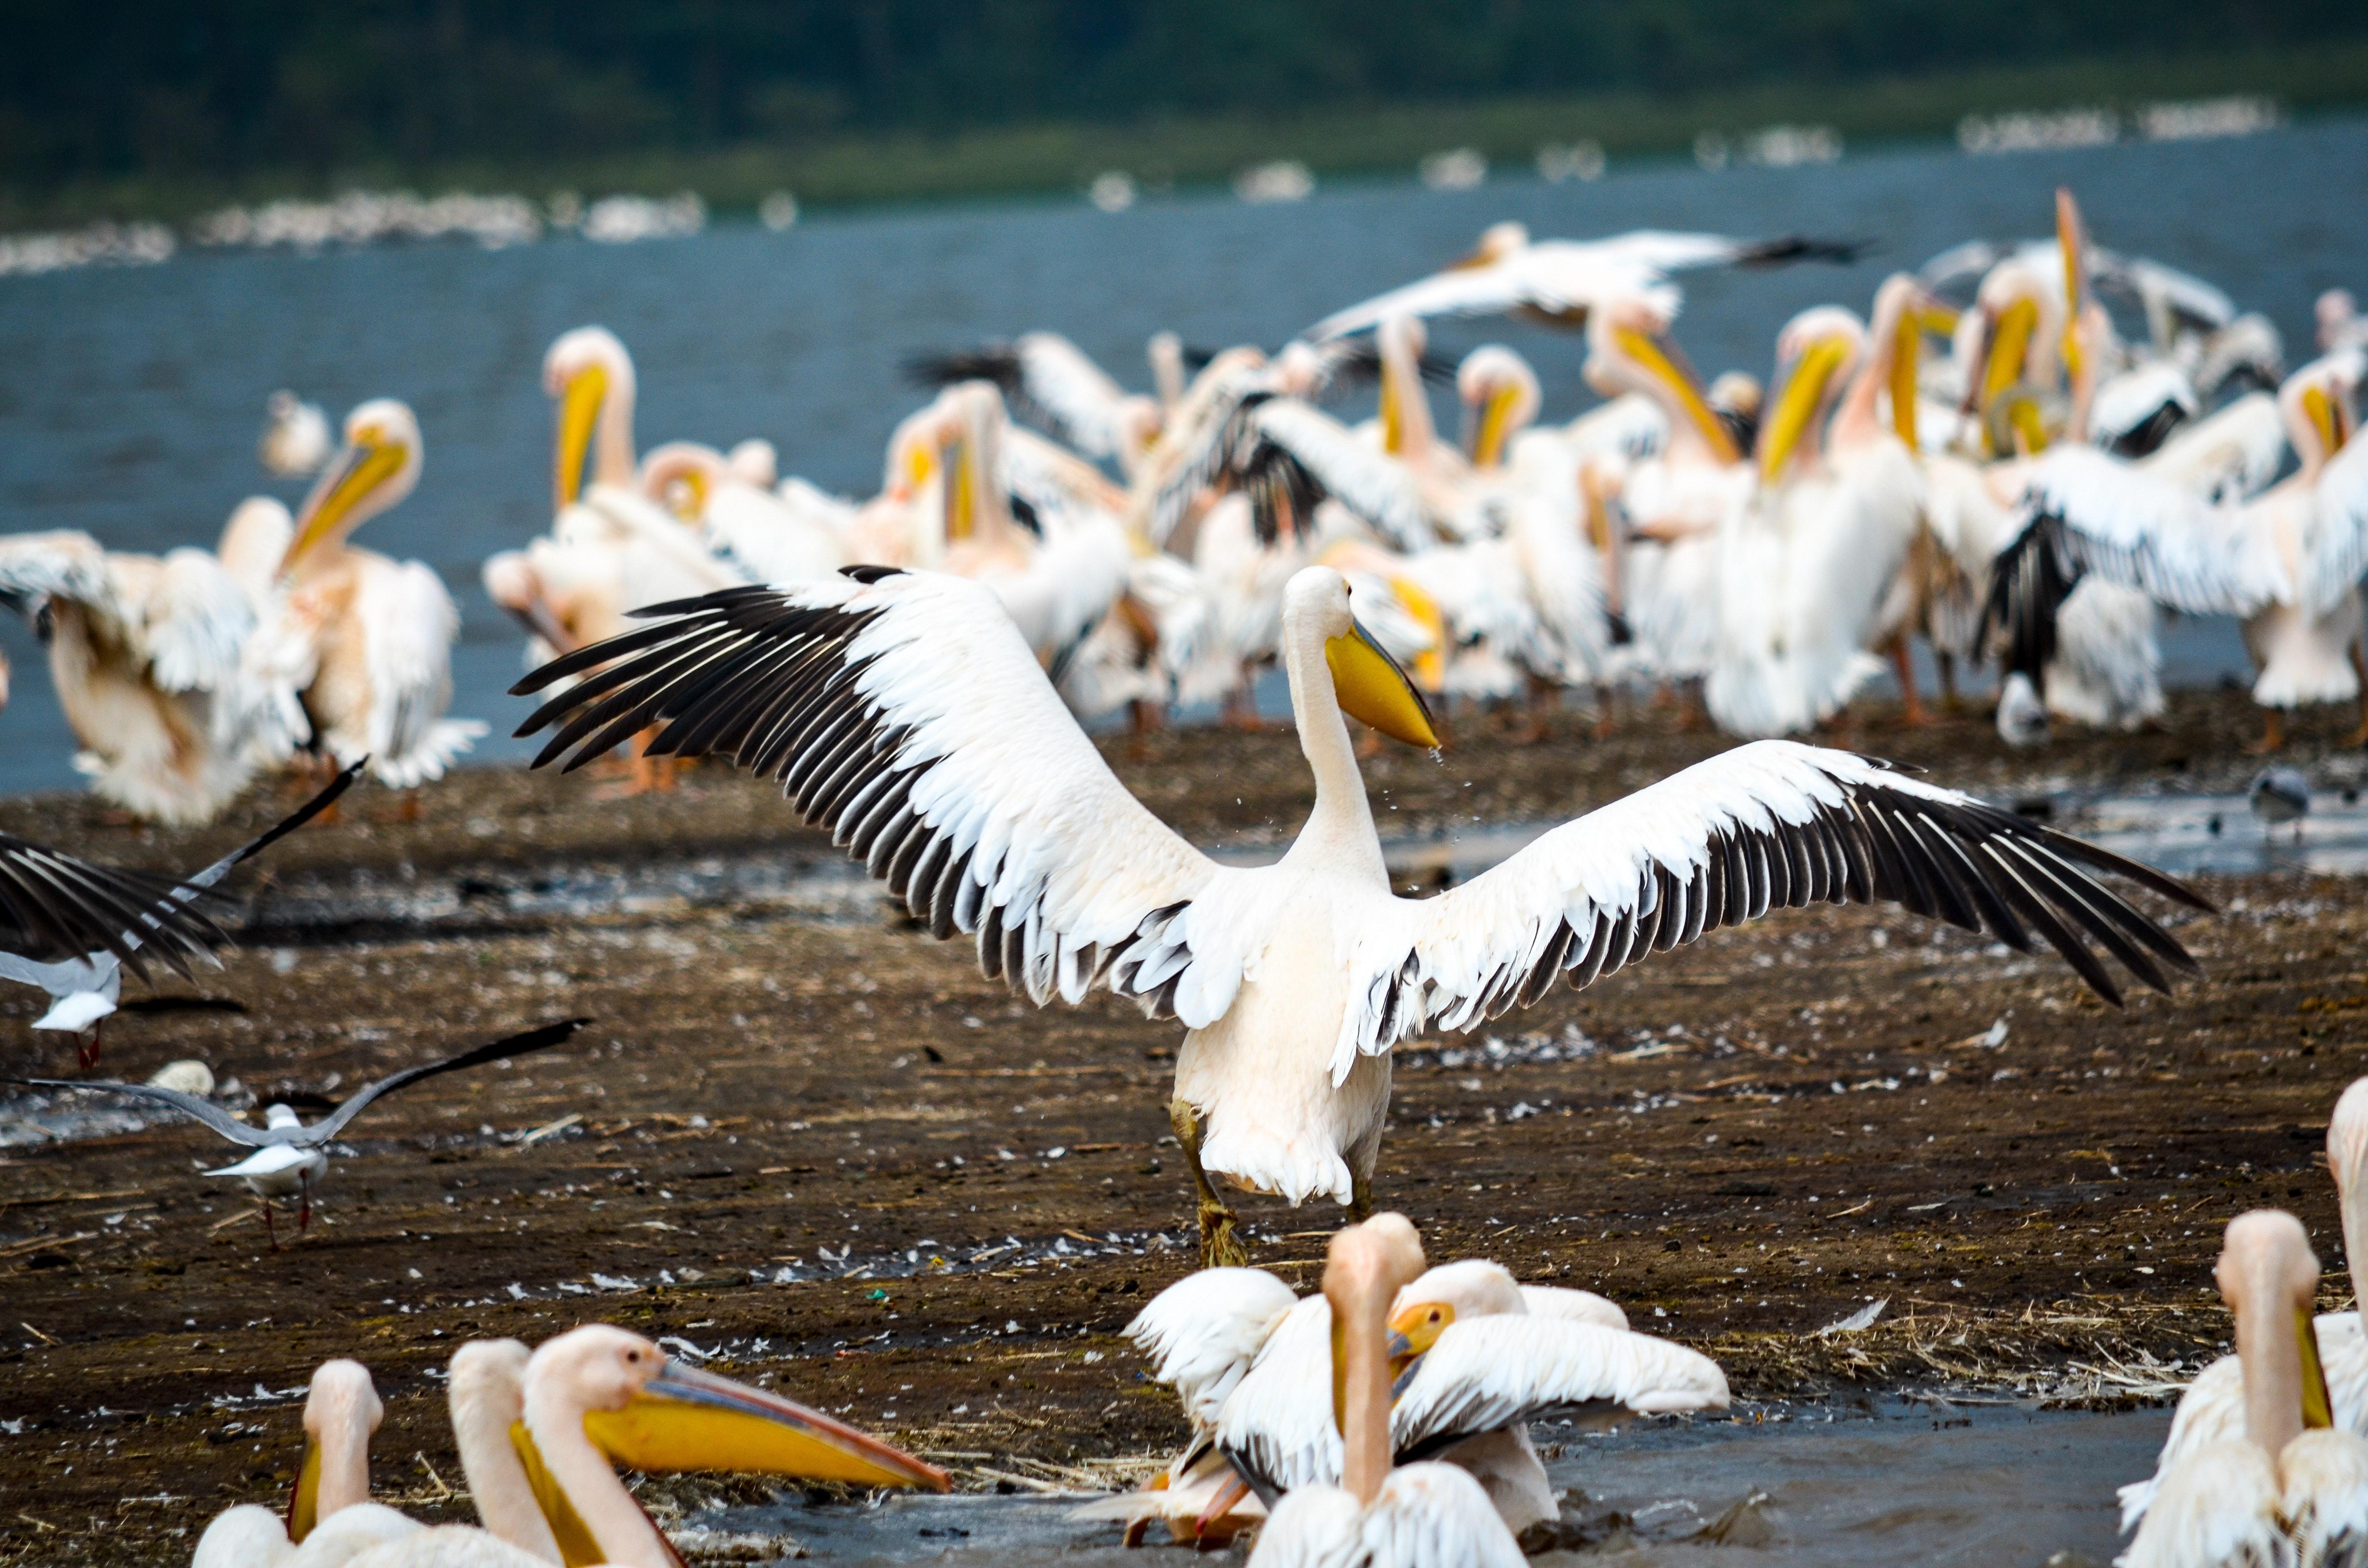 Flock of pelicans in seashore photo